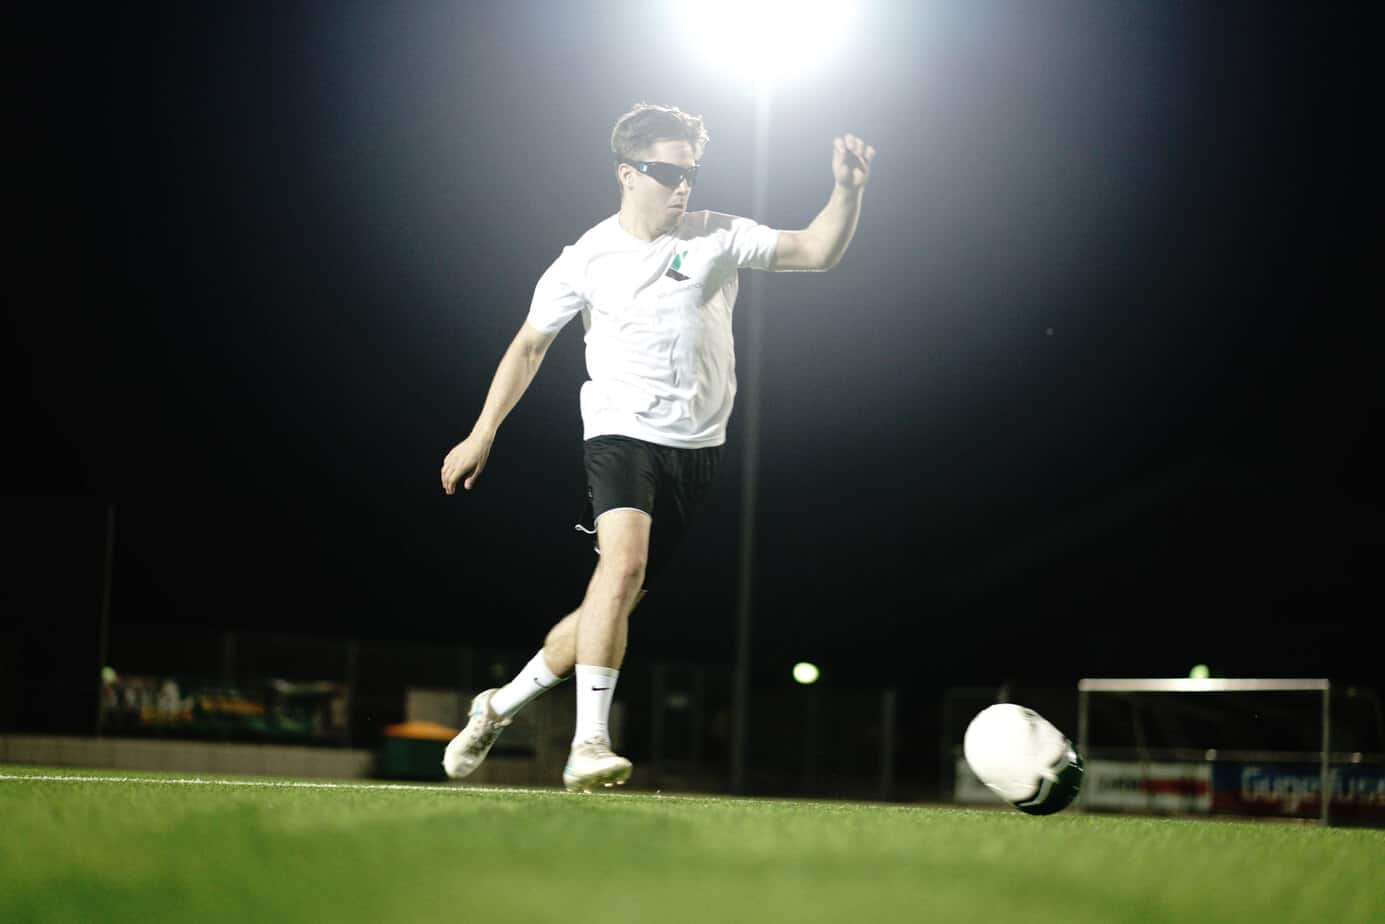 Soccerkinetics Dribbling